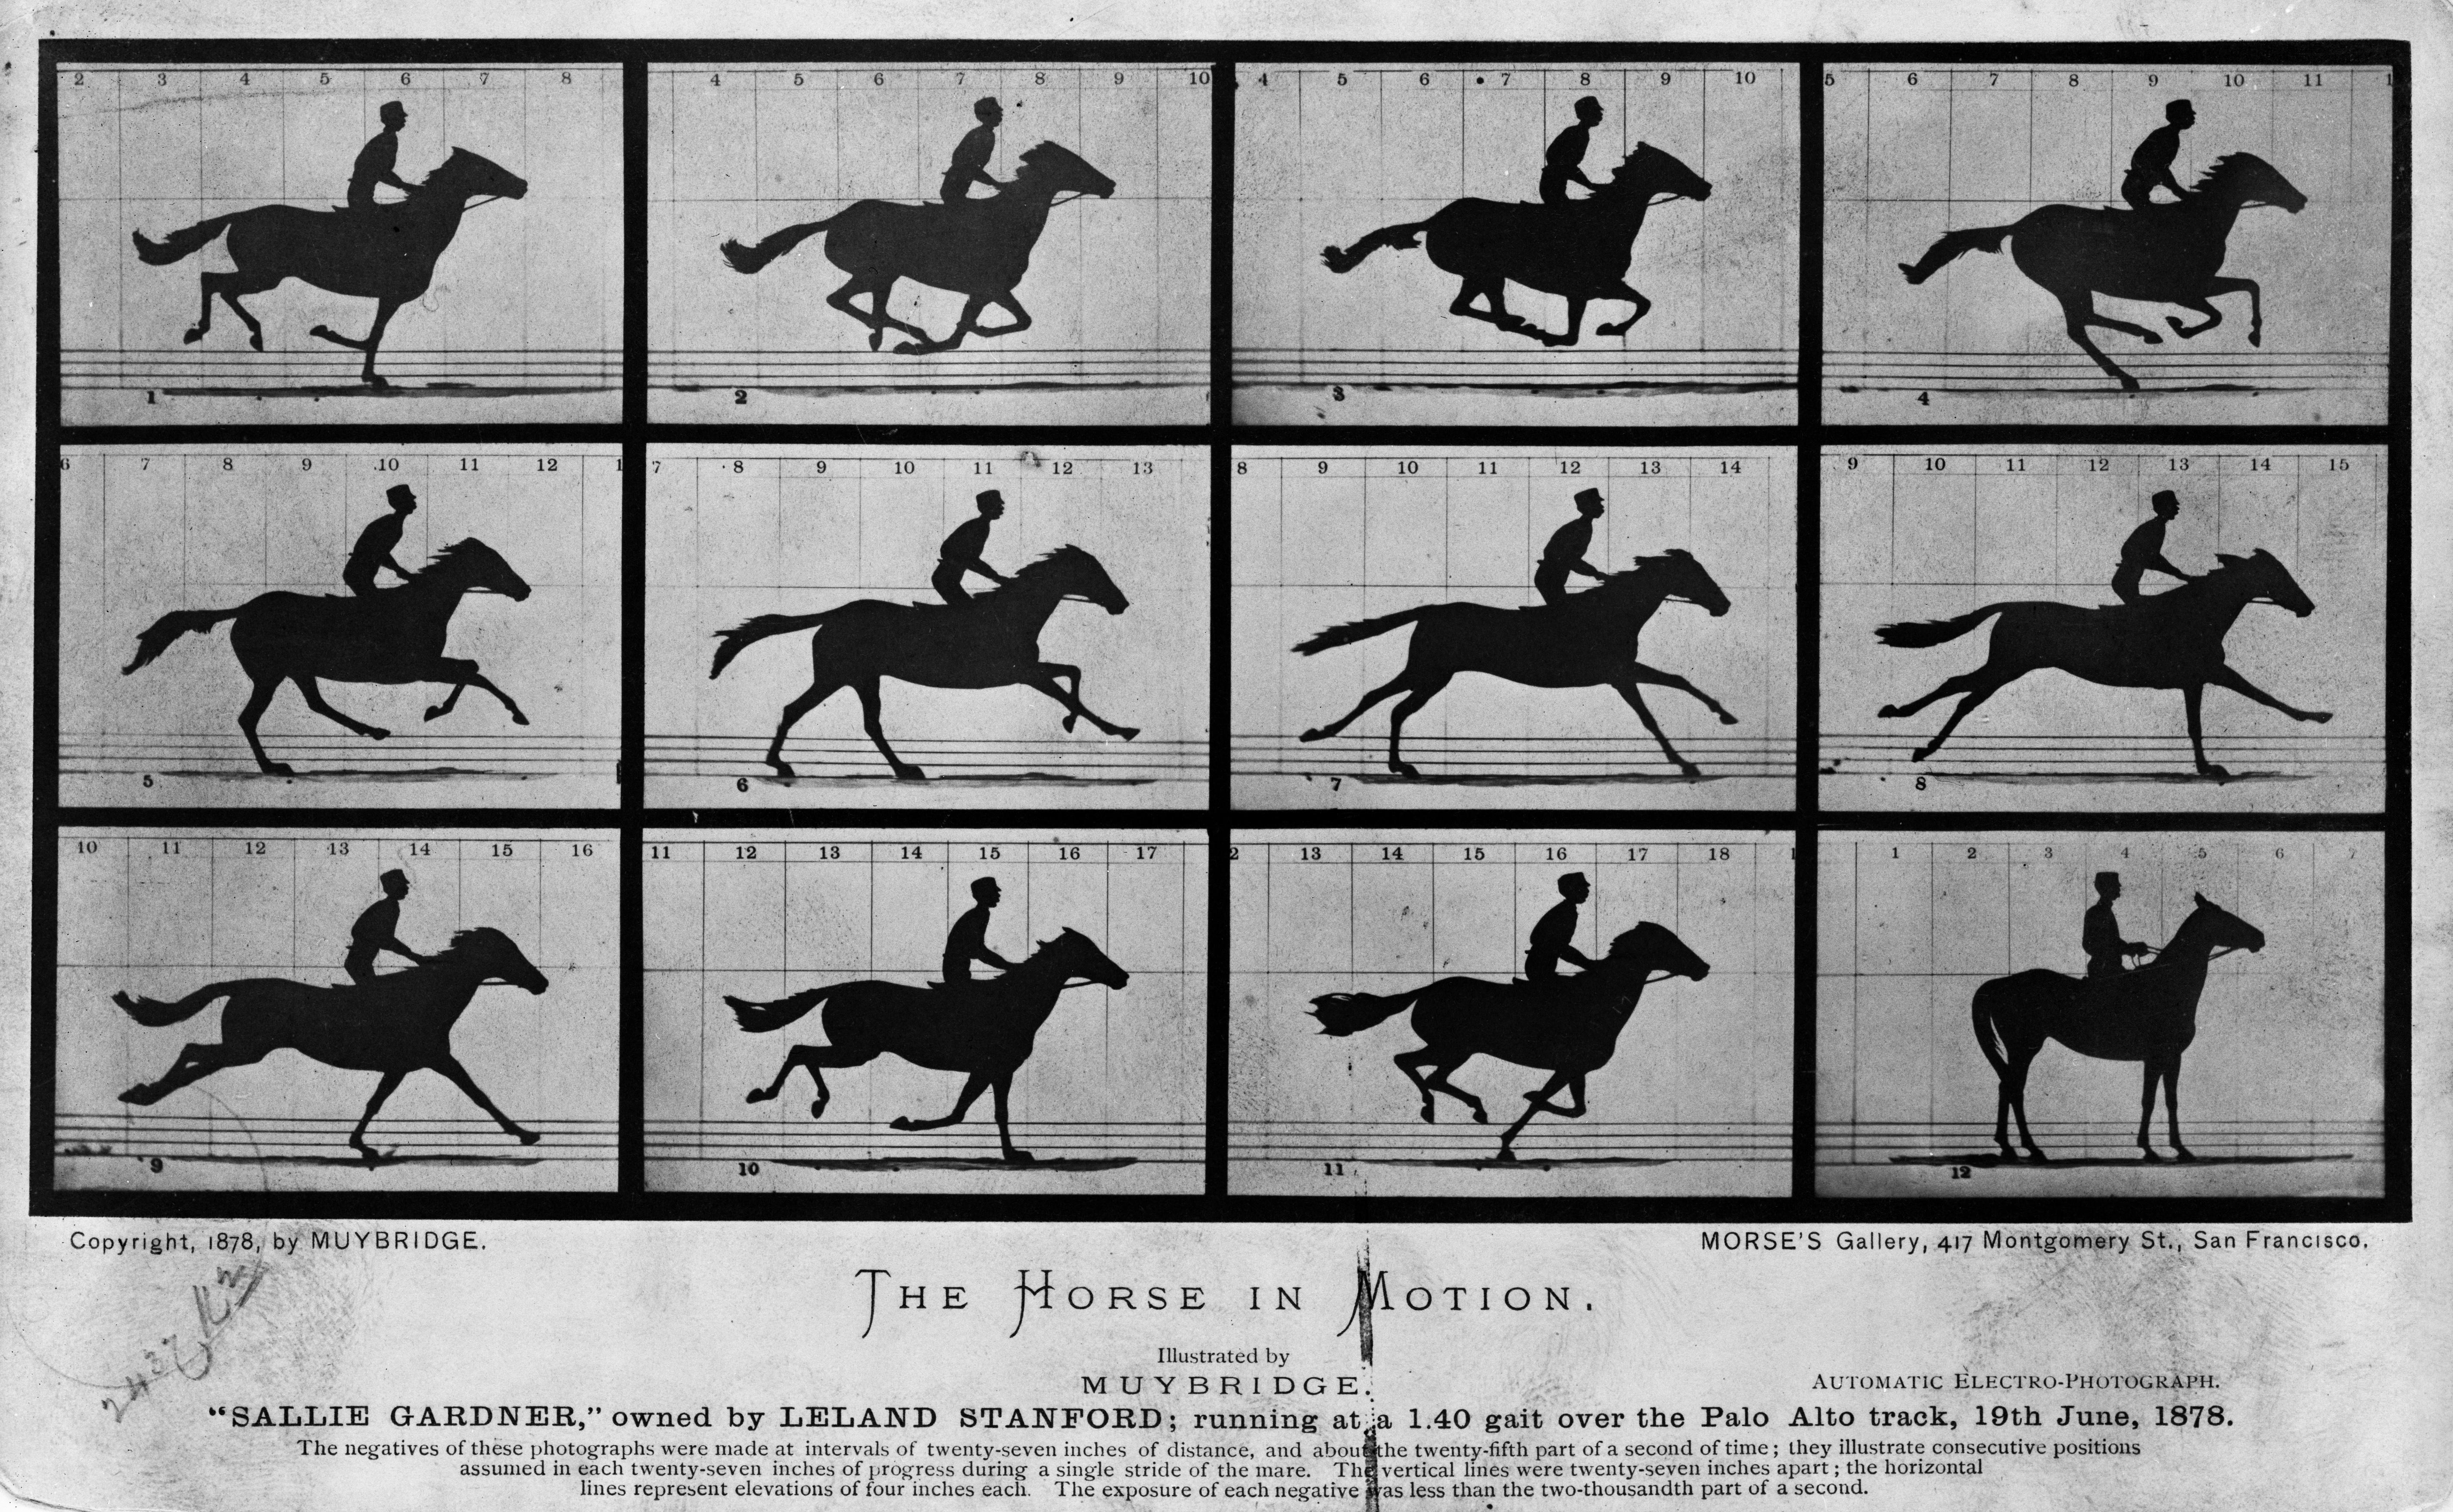 Eadweard James Muybridge,1830-1904,English photographer,studies of motion